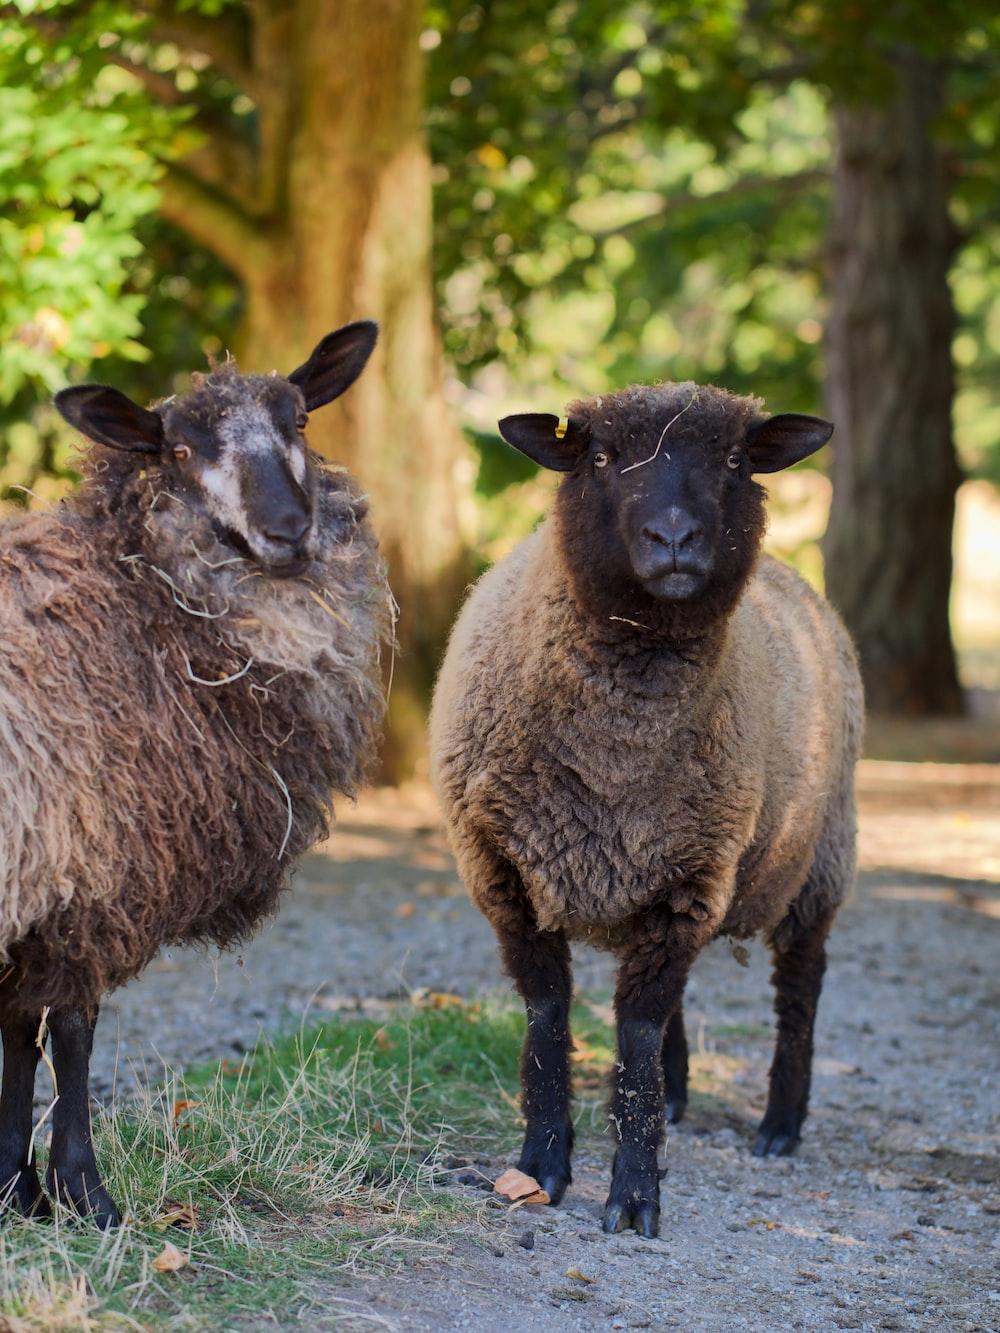 black sheep on green grass during daytime